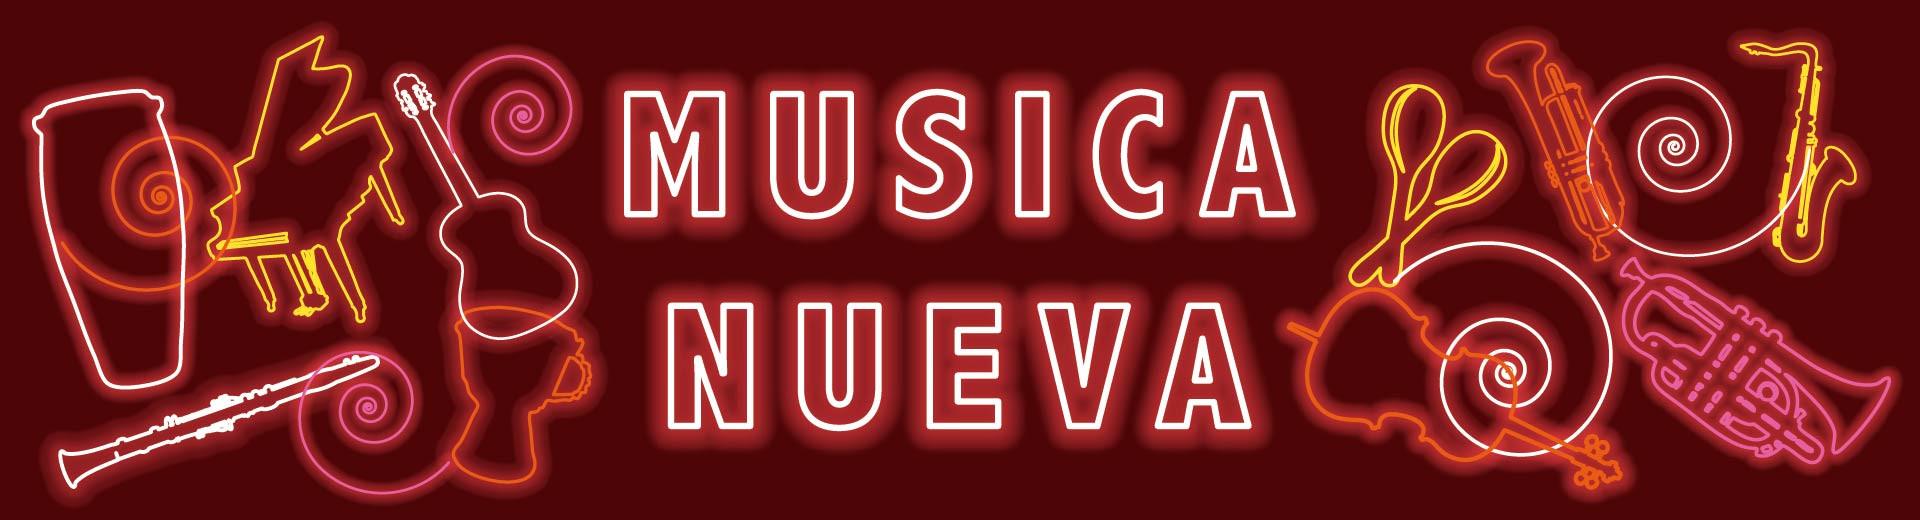 Musica Nueva